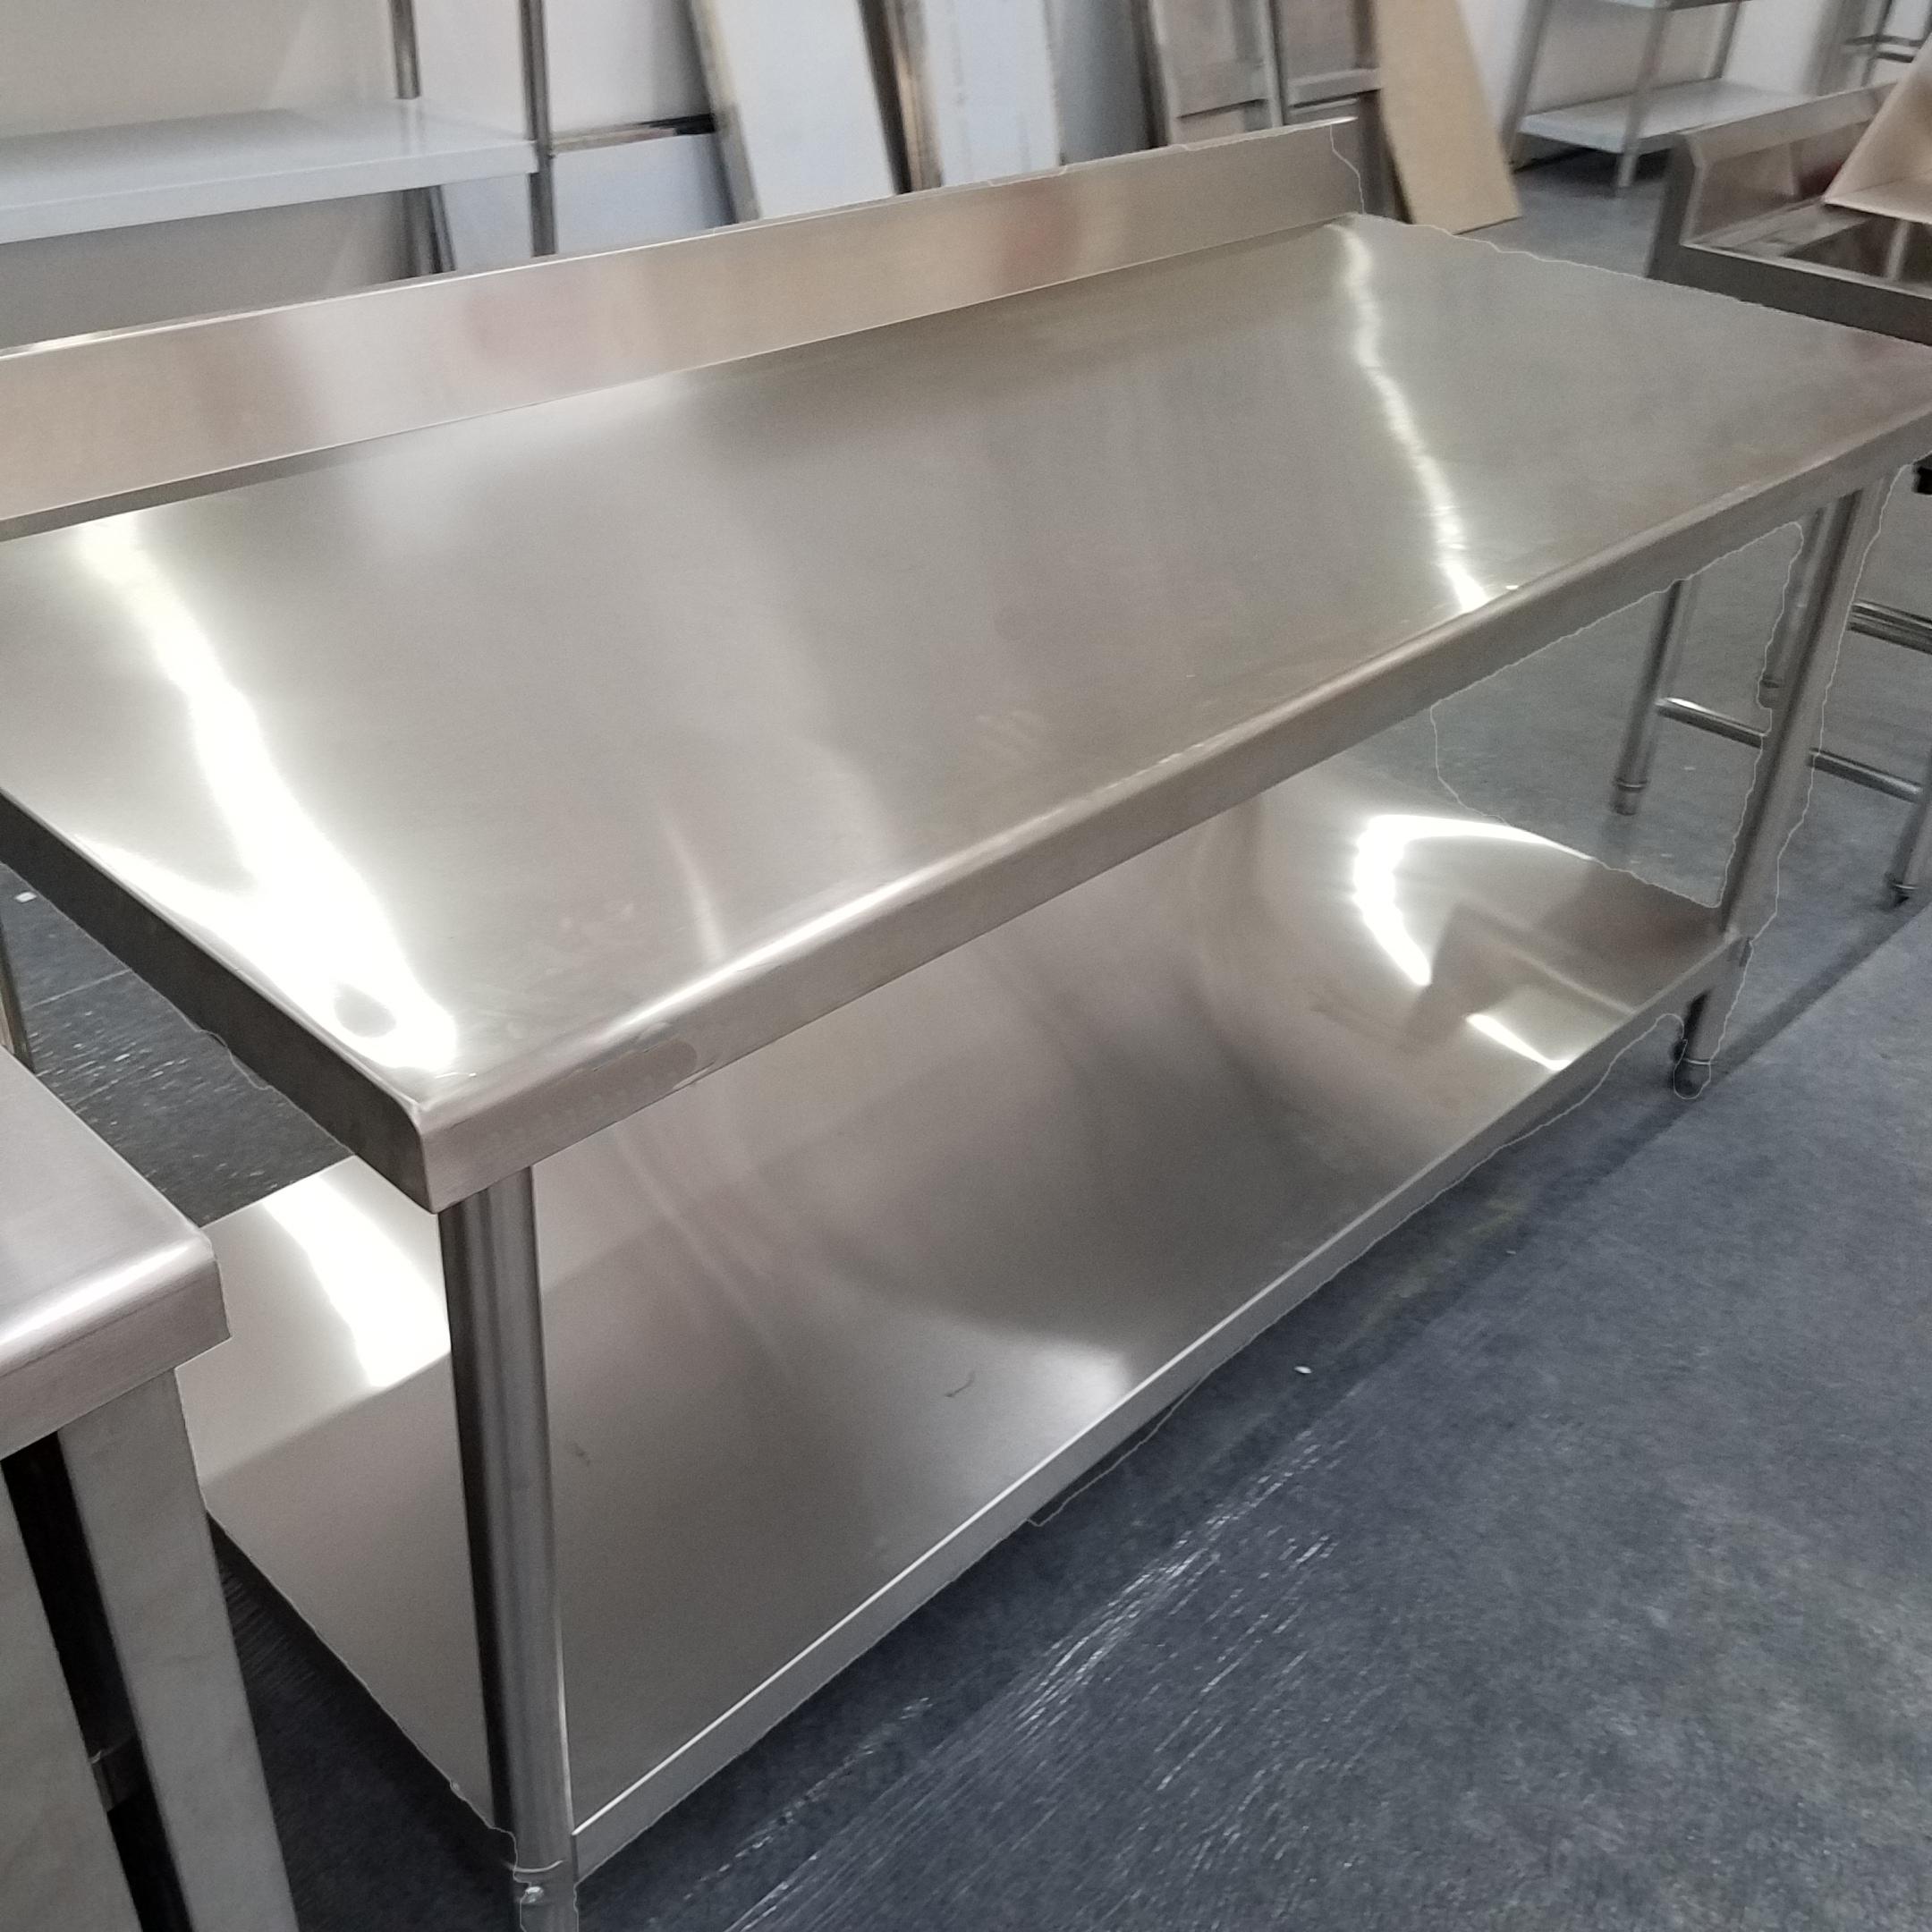 Stainless Steel Commercial Kitchen Prep Work Table W Backsplash Buy Stainless Steel Backsplash Commercial Kitchen Work Table Stainless Steel Kitchen Backsplash Product On Alibaba Com